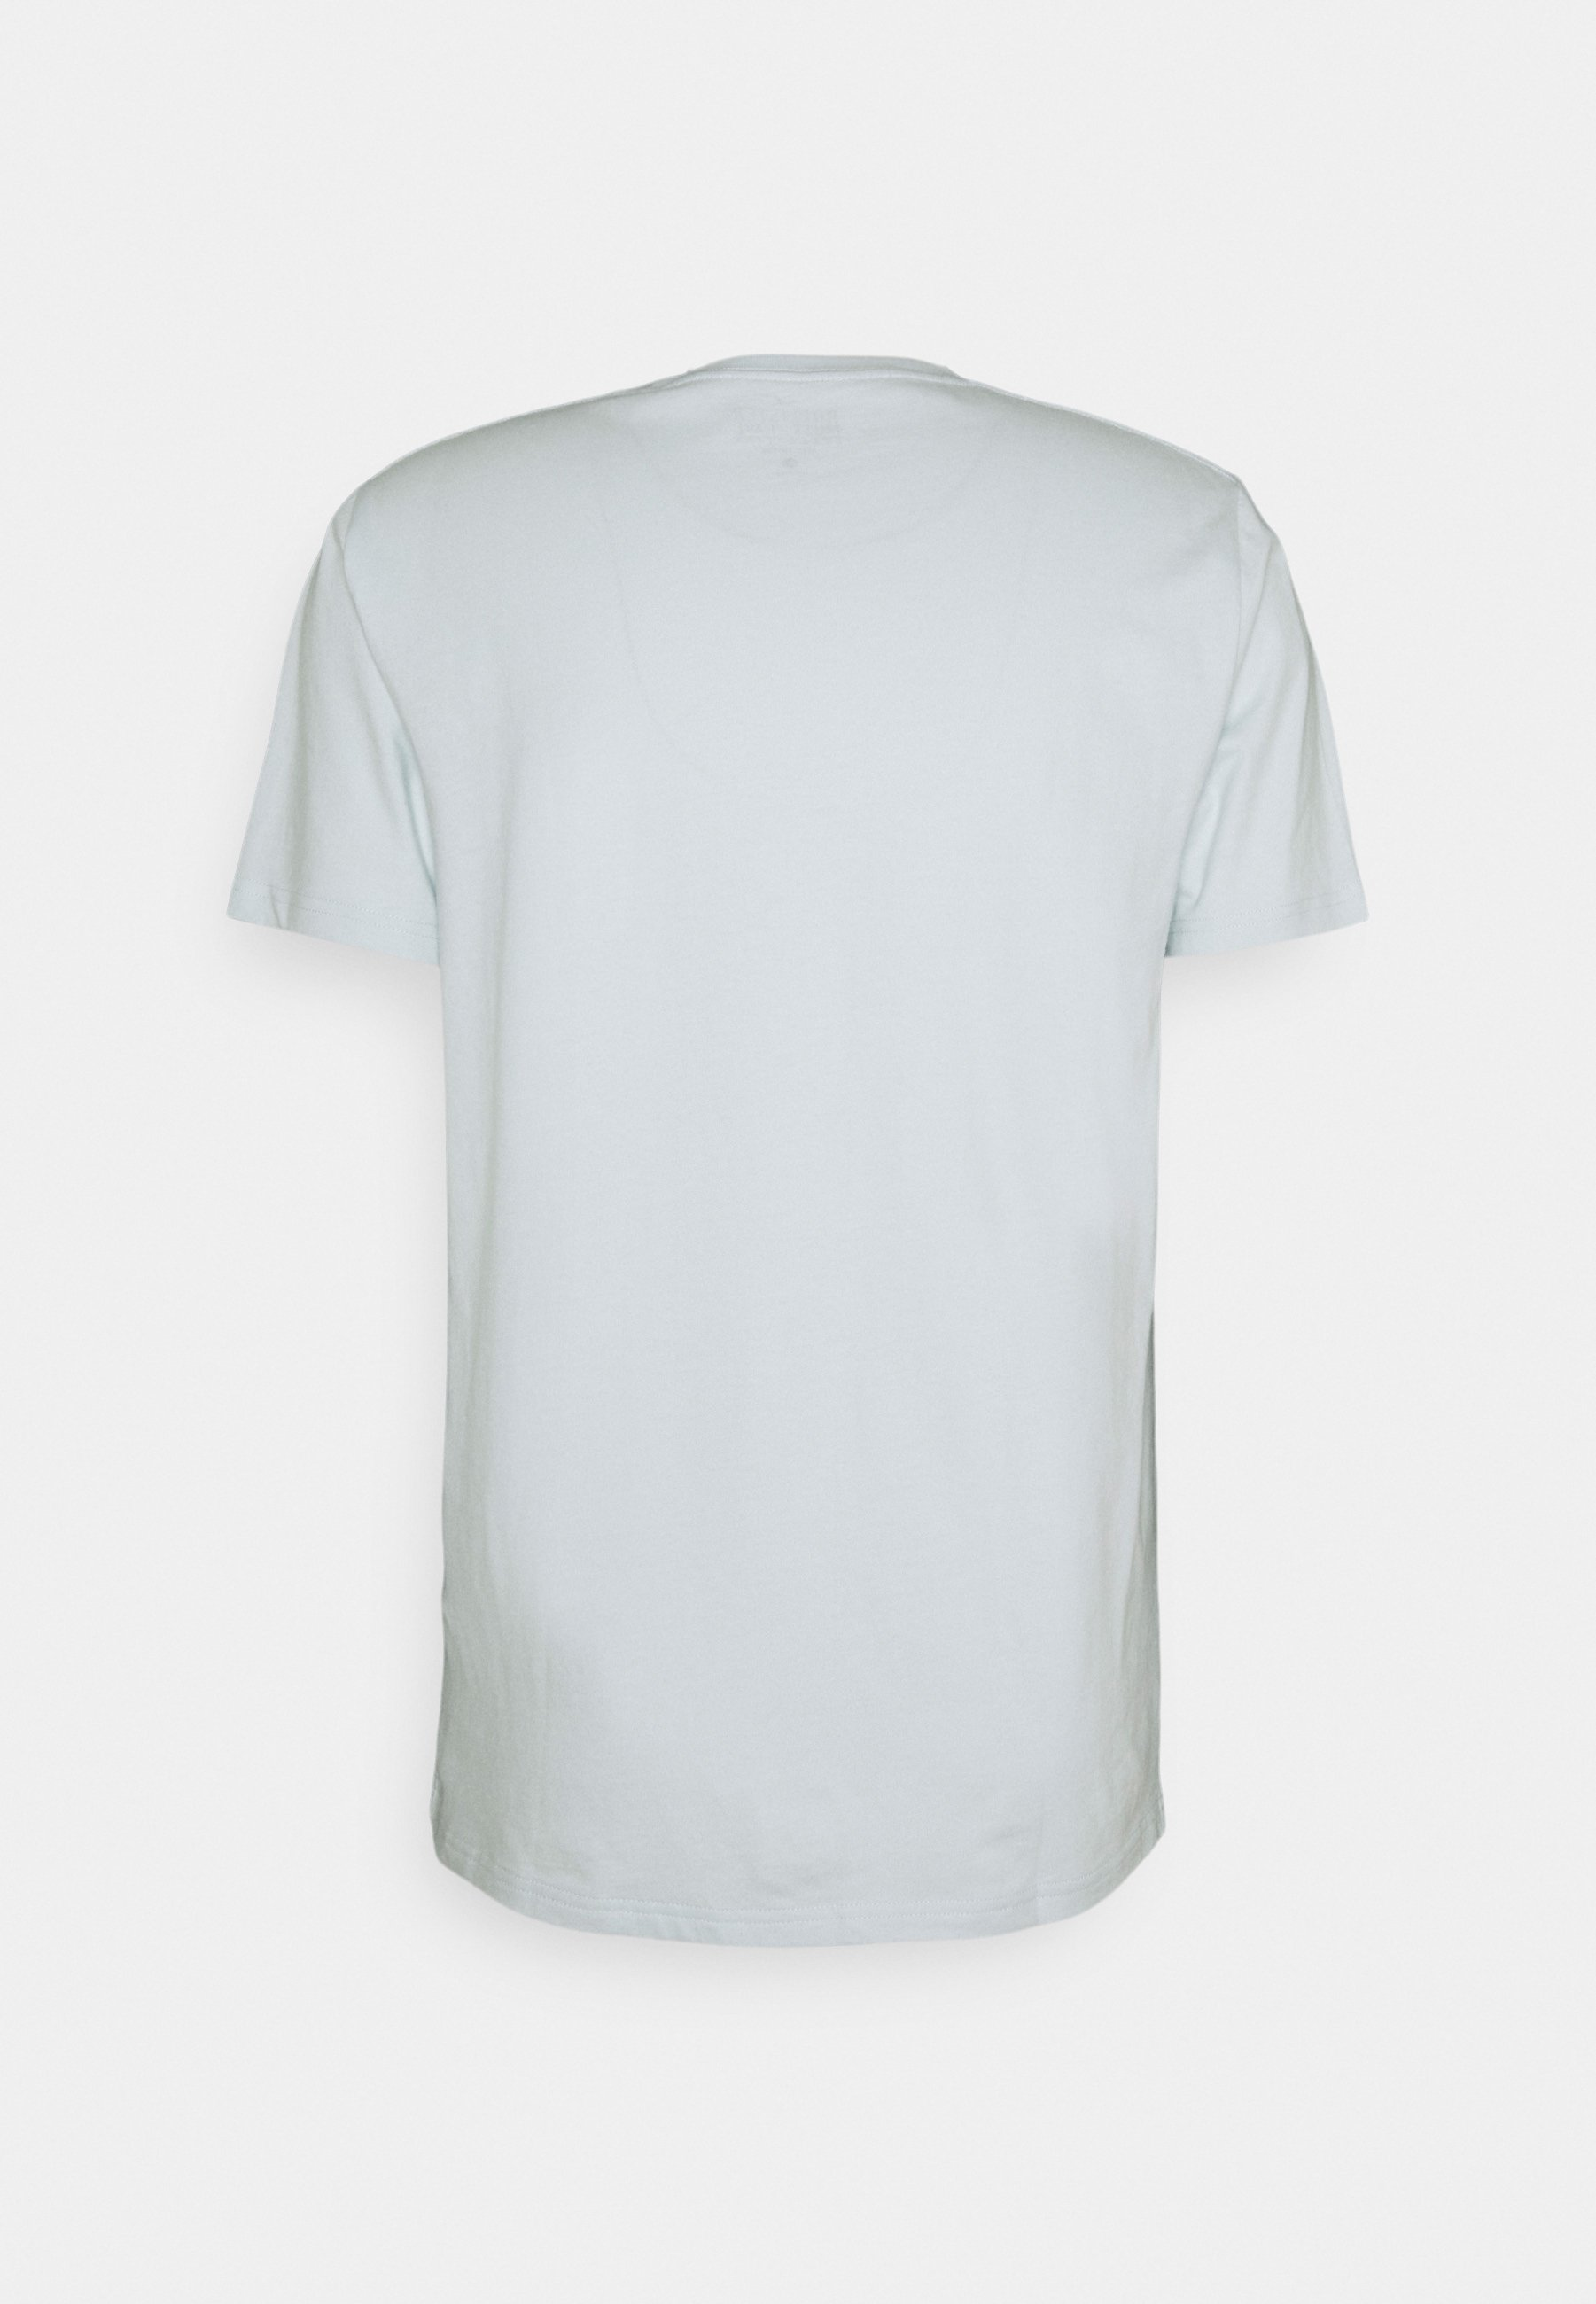 Homme MULTI SEASONAL CREW 3 PACK - T-shirt basique